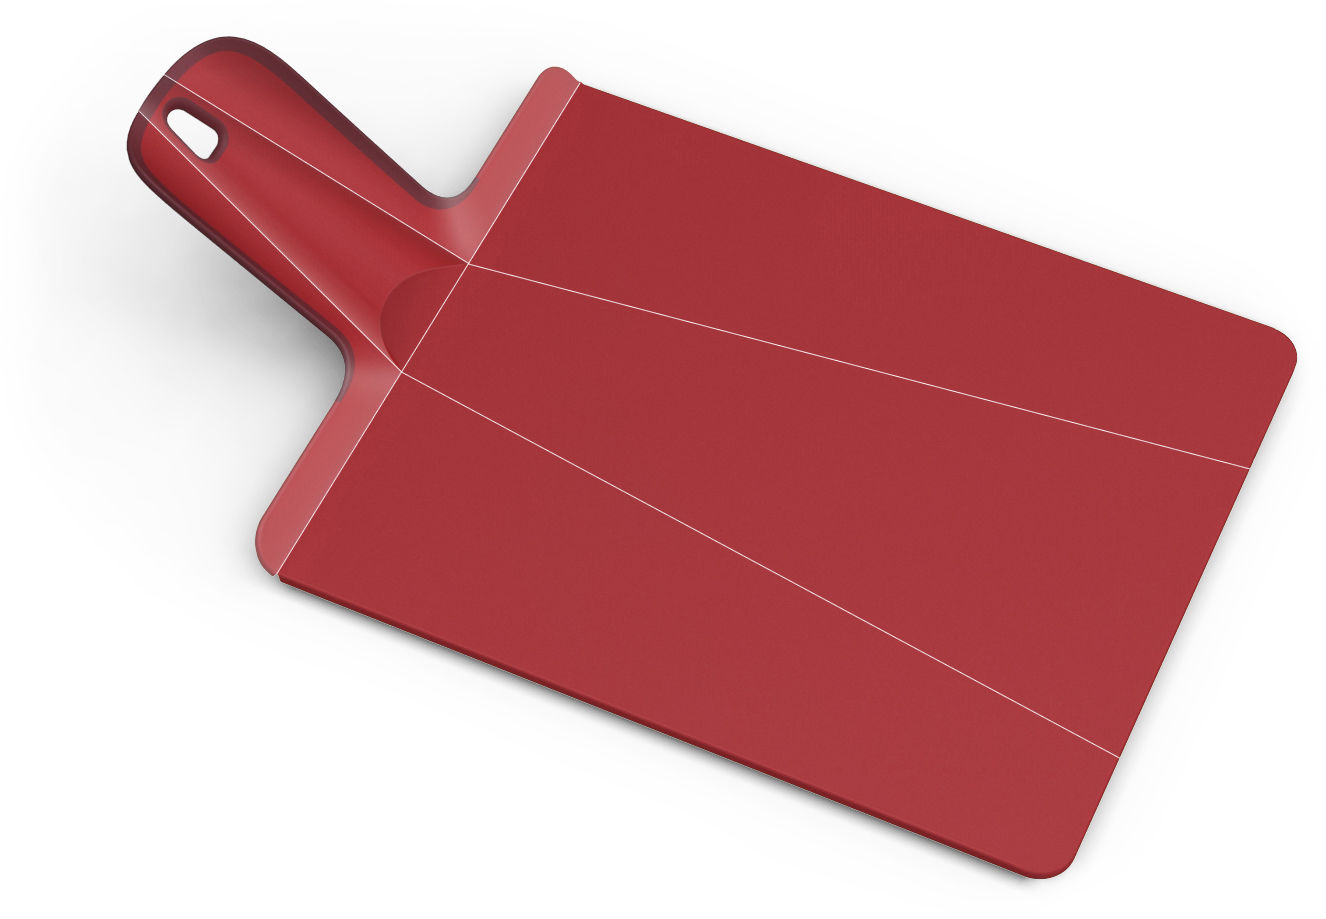 Cucina - Pratici e intelligenti - Tagliere Chop2Pot - pieghevole di Joseph Joseph - Rosso - Polipropilene